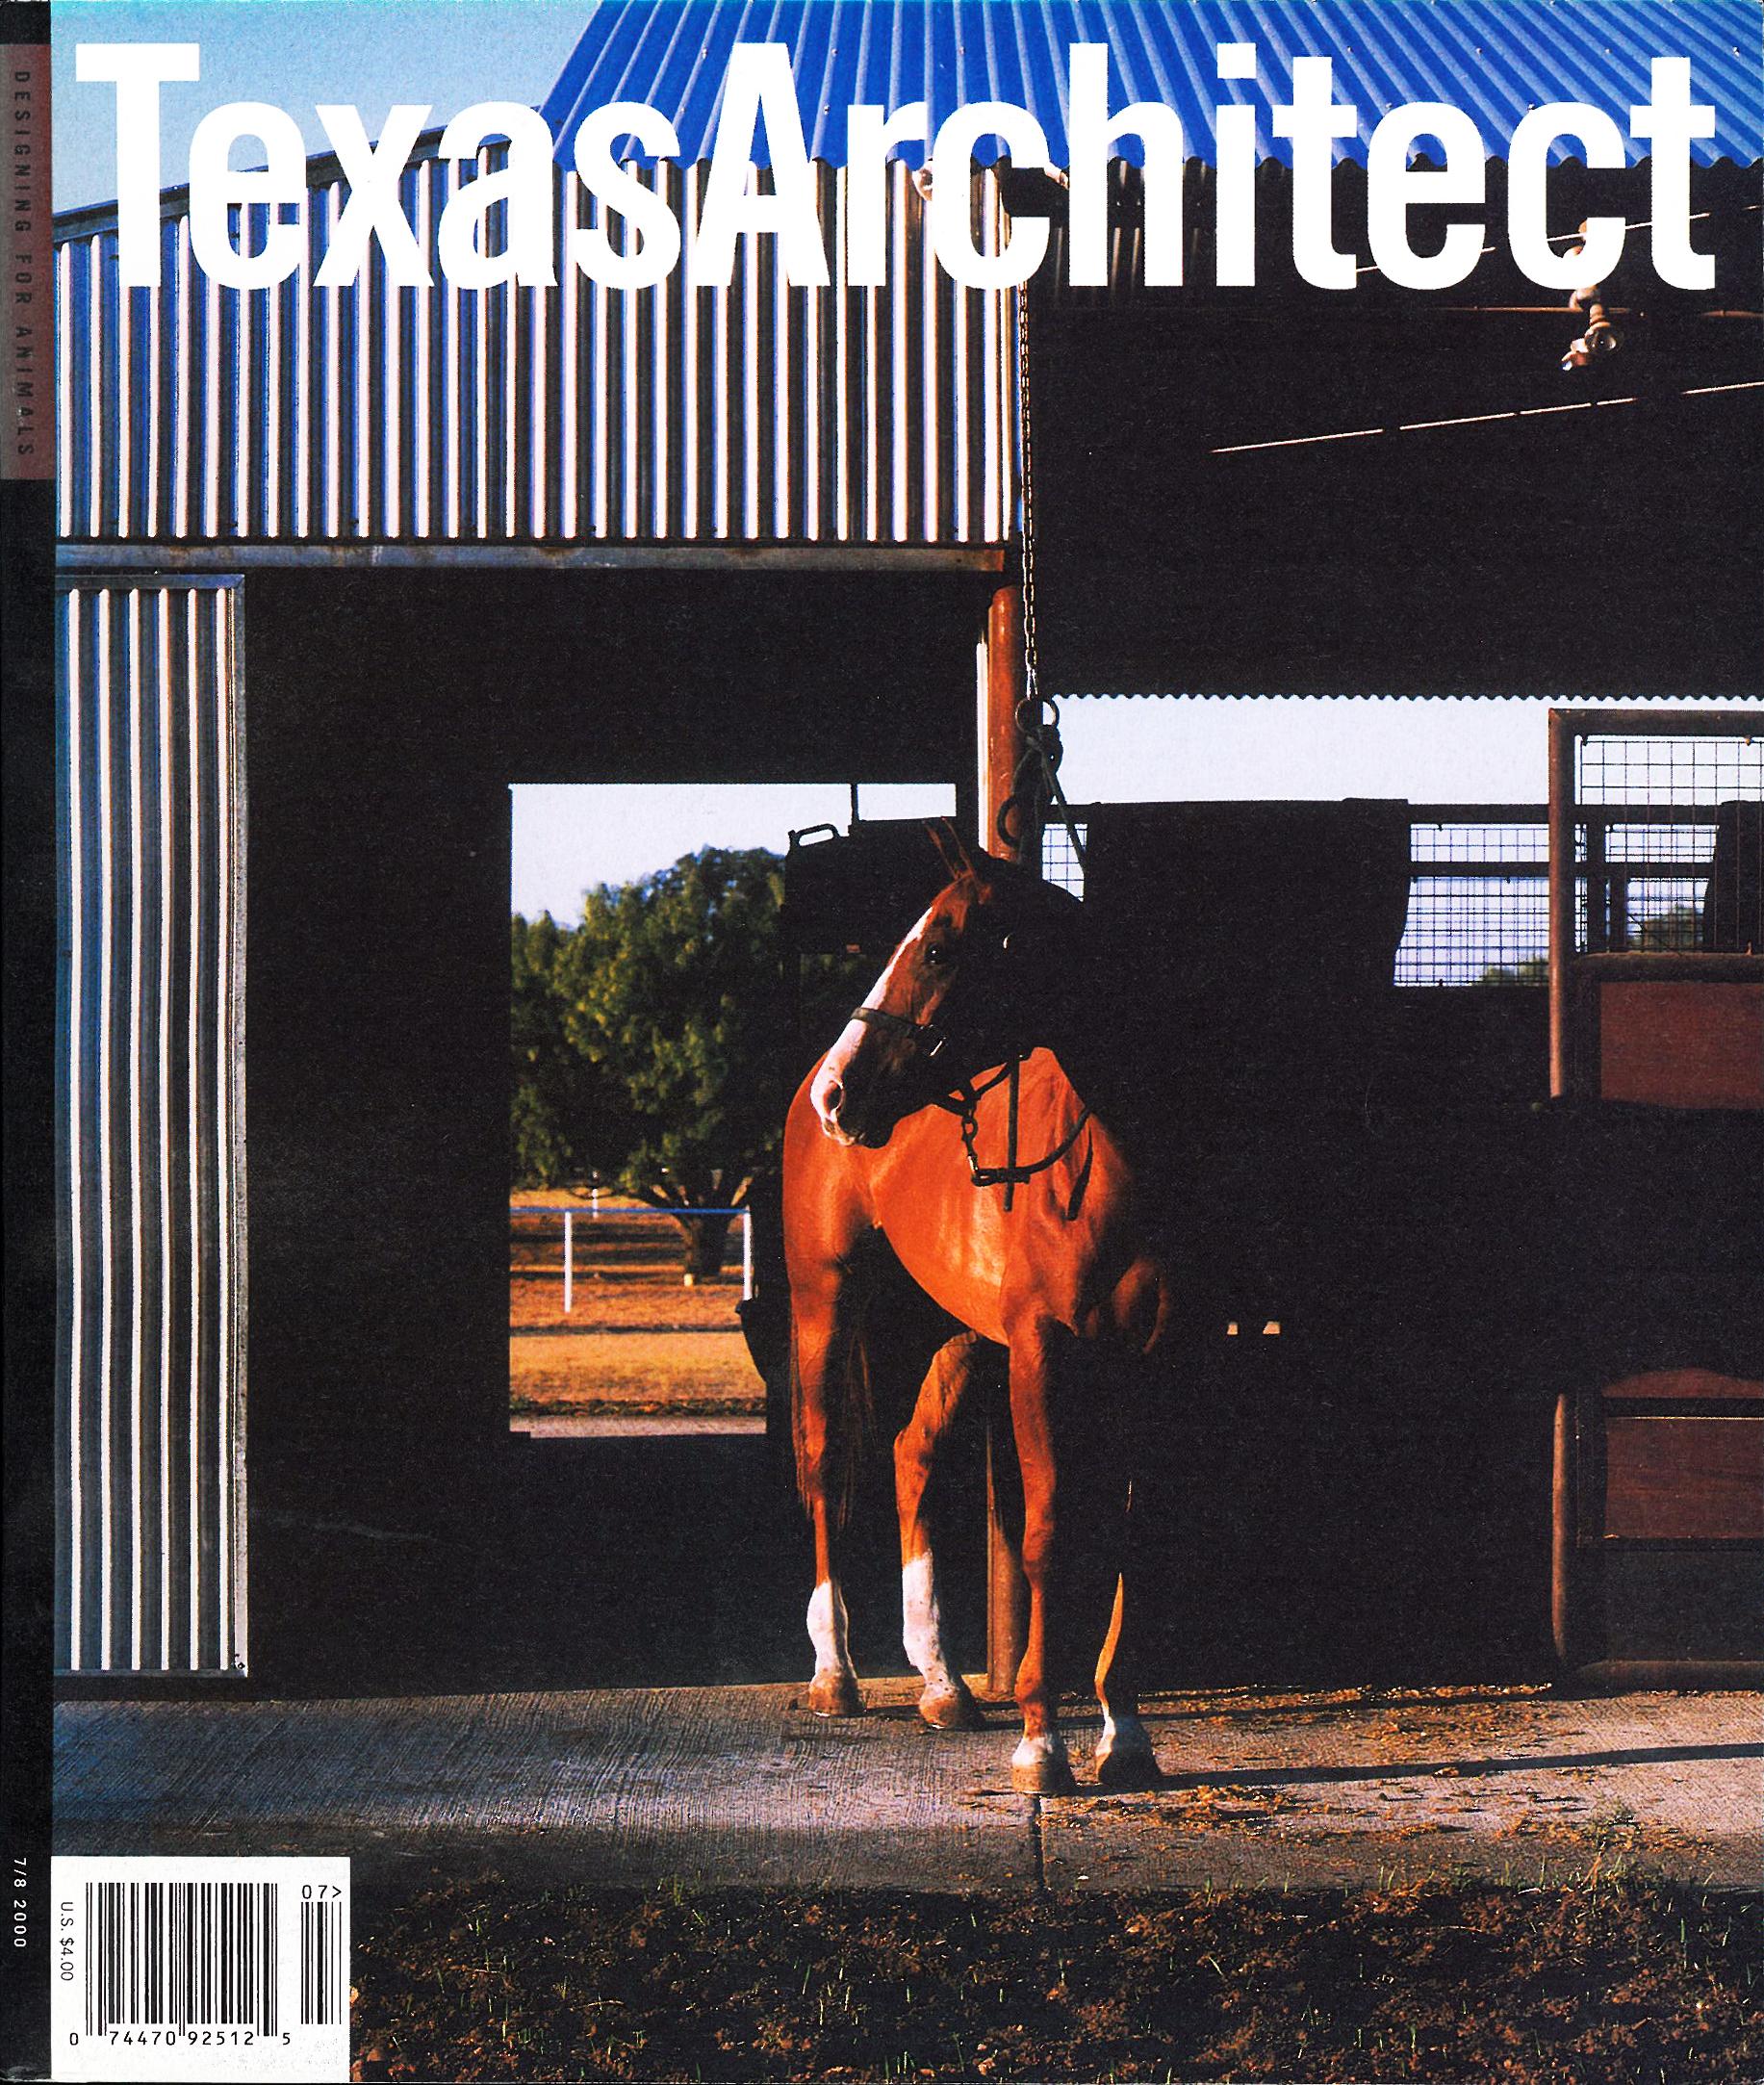 Texas Architect 2000